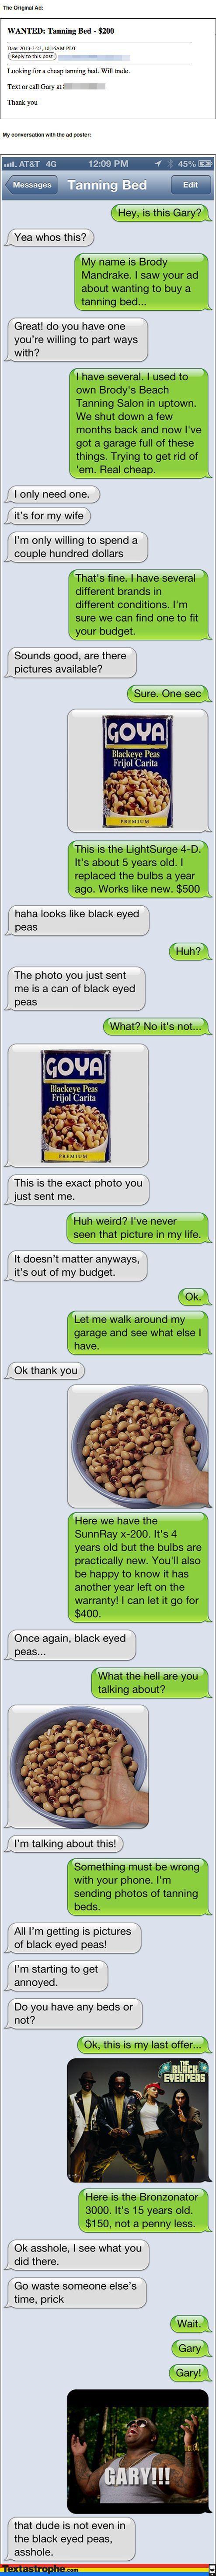 Trolling: You